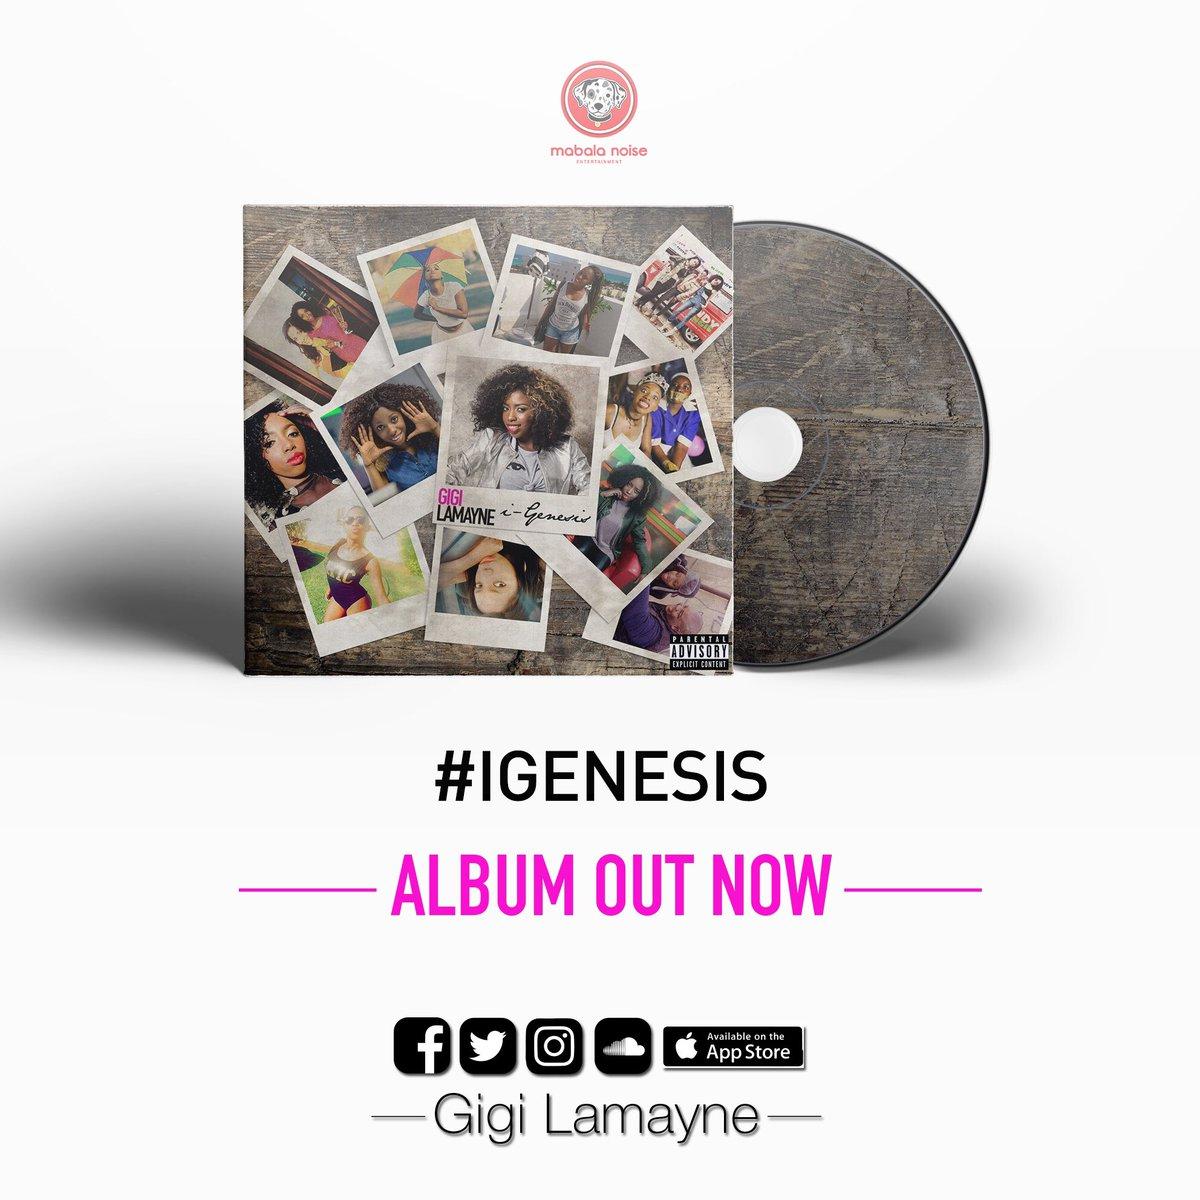 Stream & Download Gigi Lamayne's iGenesis Album